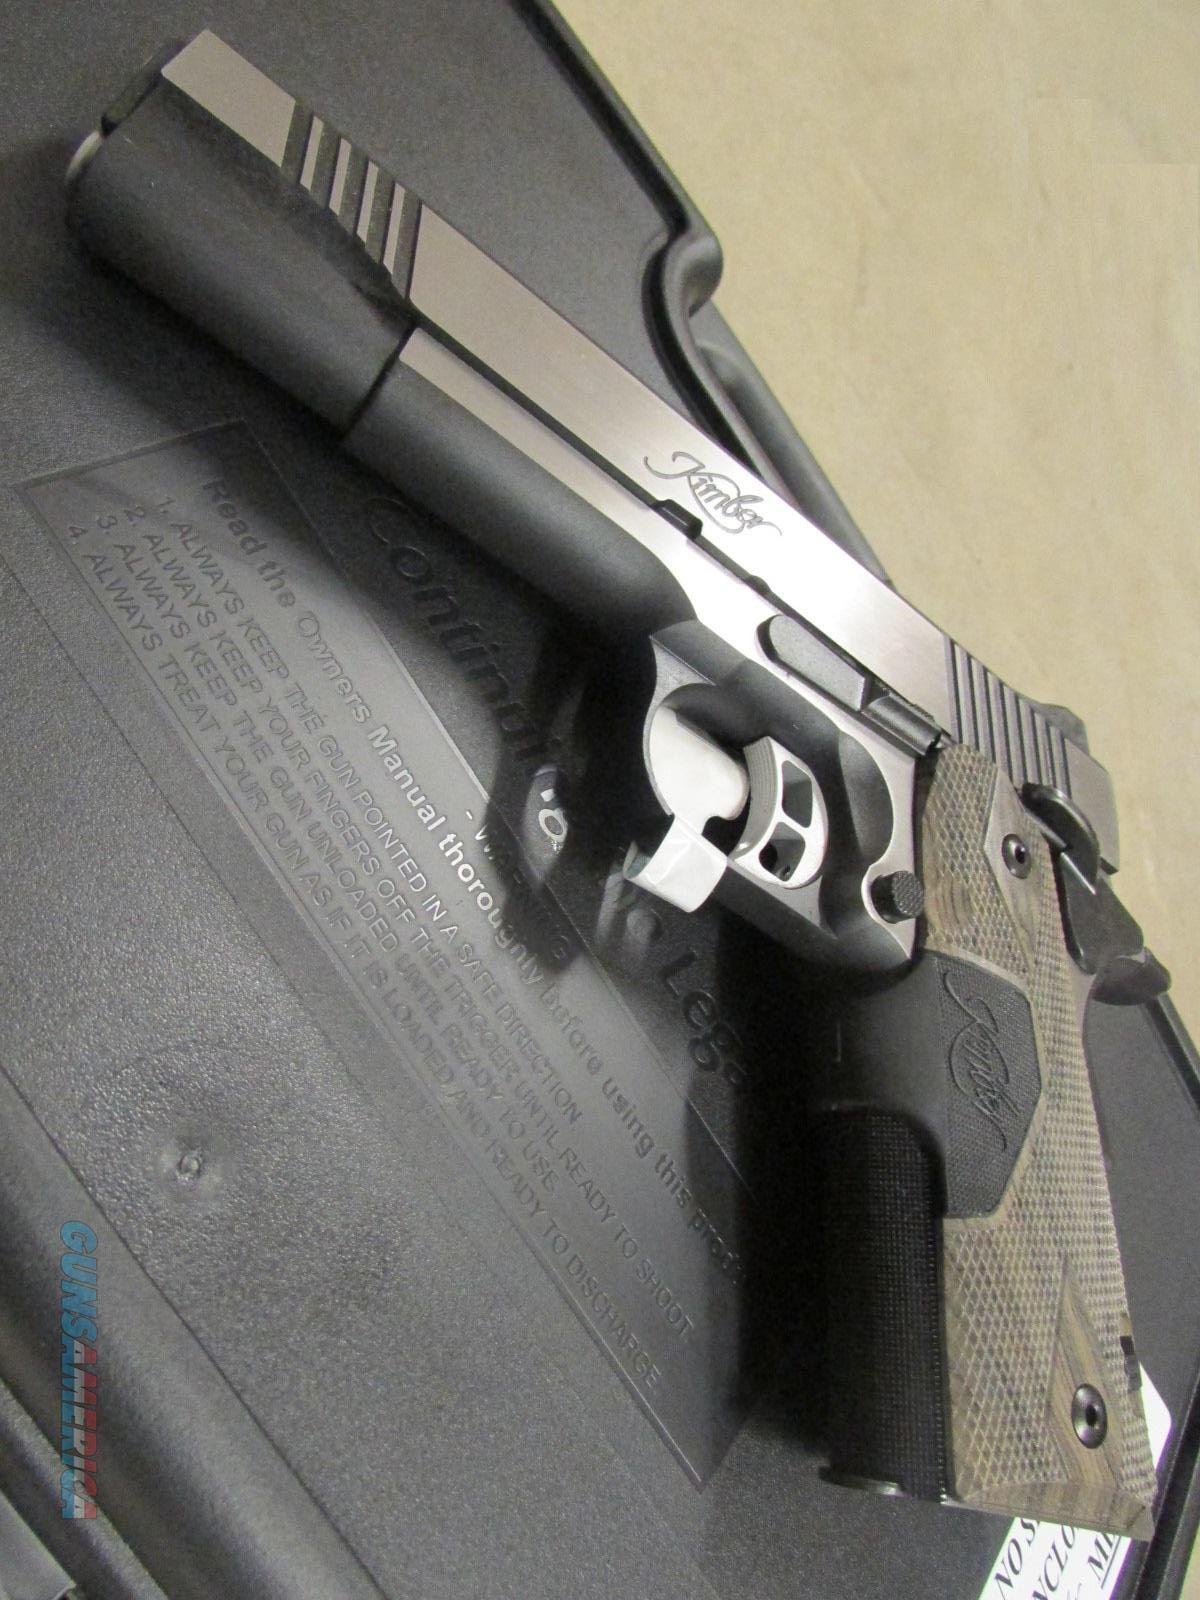 Kimber Mfg 1911 Eclipse Custom Ii Lg 45 Acp 5in Handgun Parts Diagram Search Pistol Firearm Gun Stainless 8 1rd